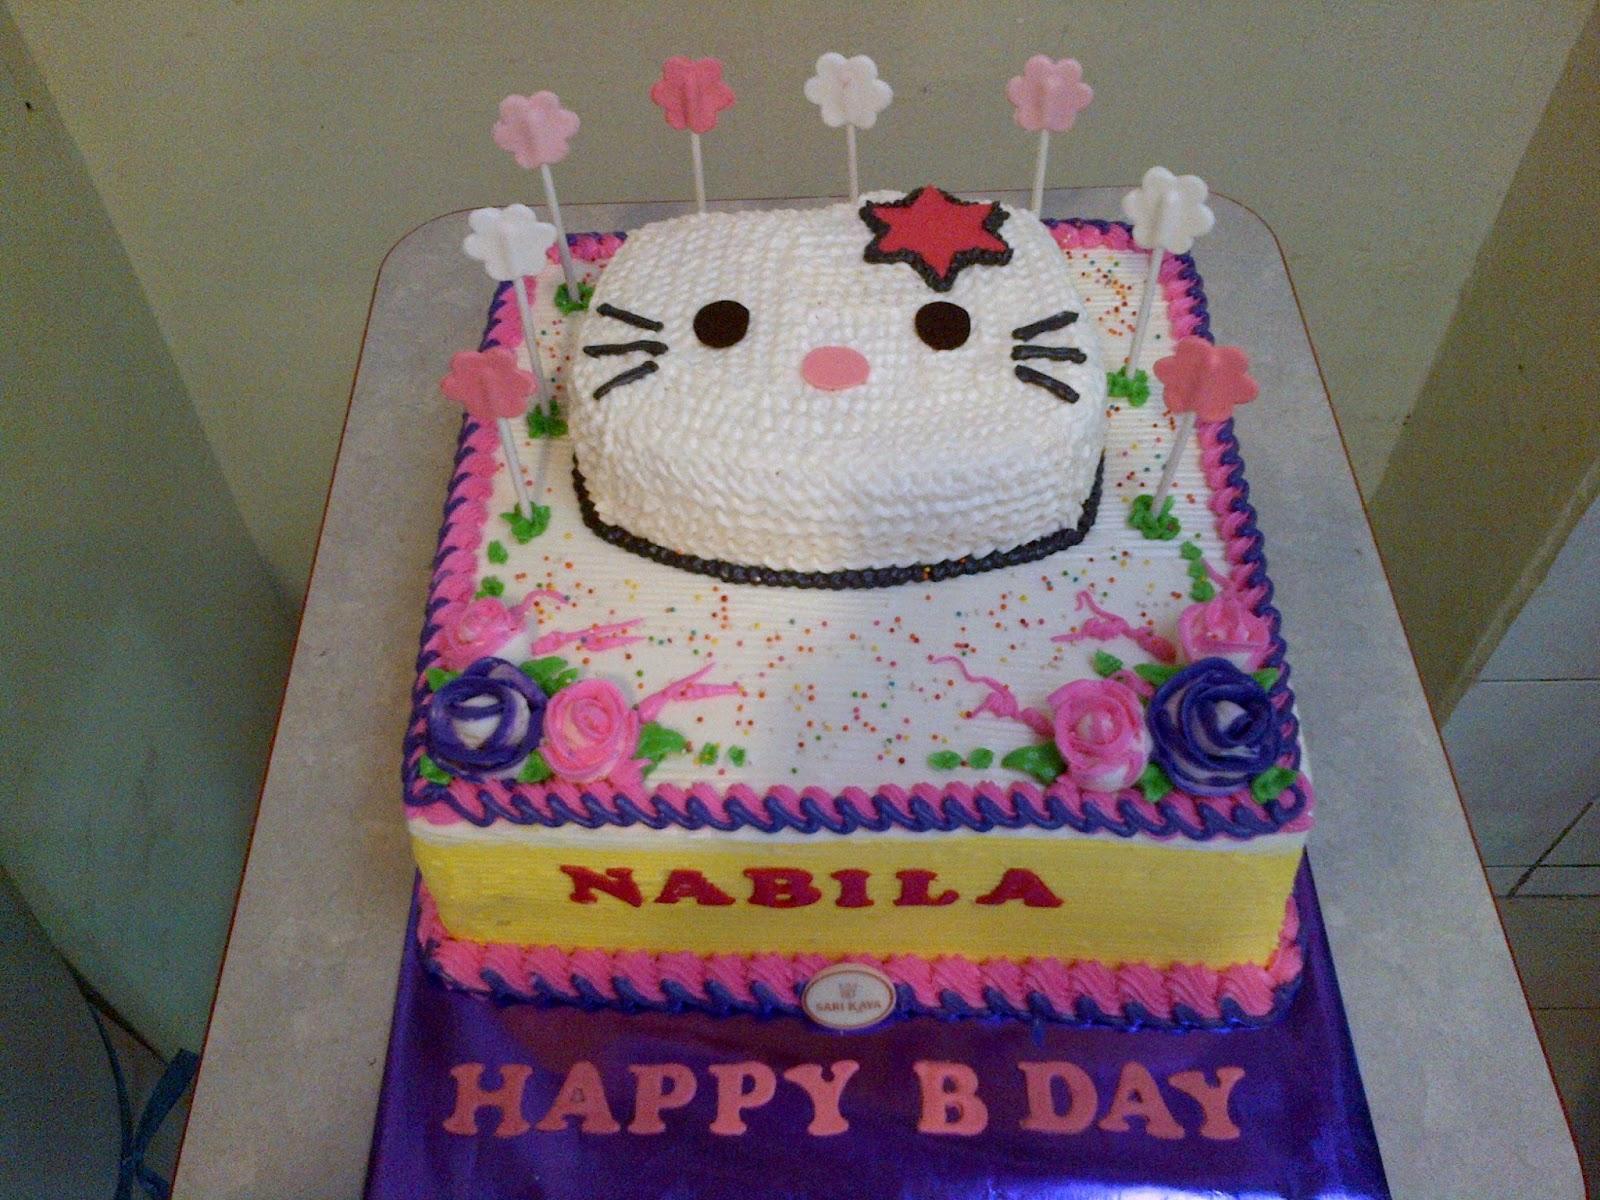 ... kue 25 x 25 cm, dengan tambahan 1 tupuk kue pola hello kitty, dihias